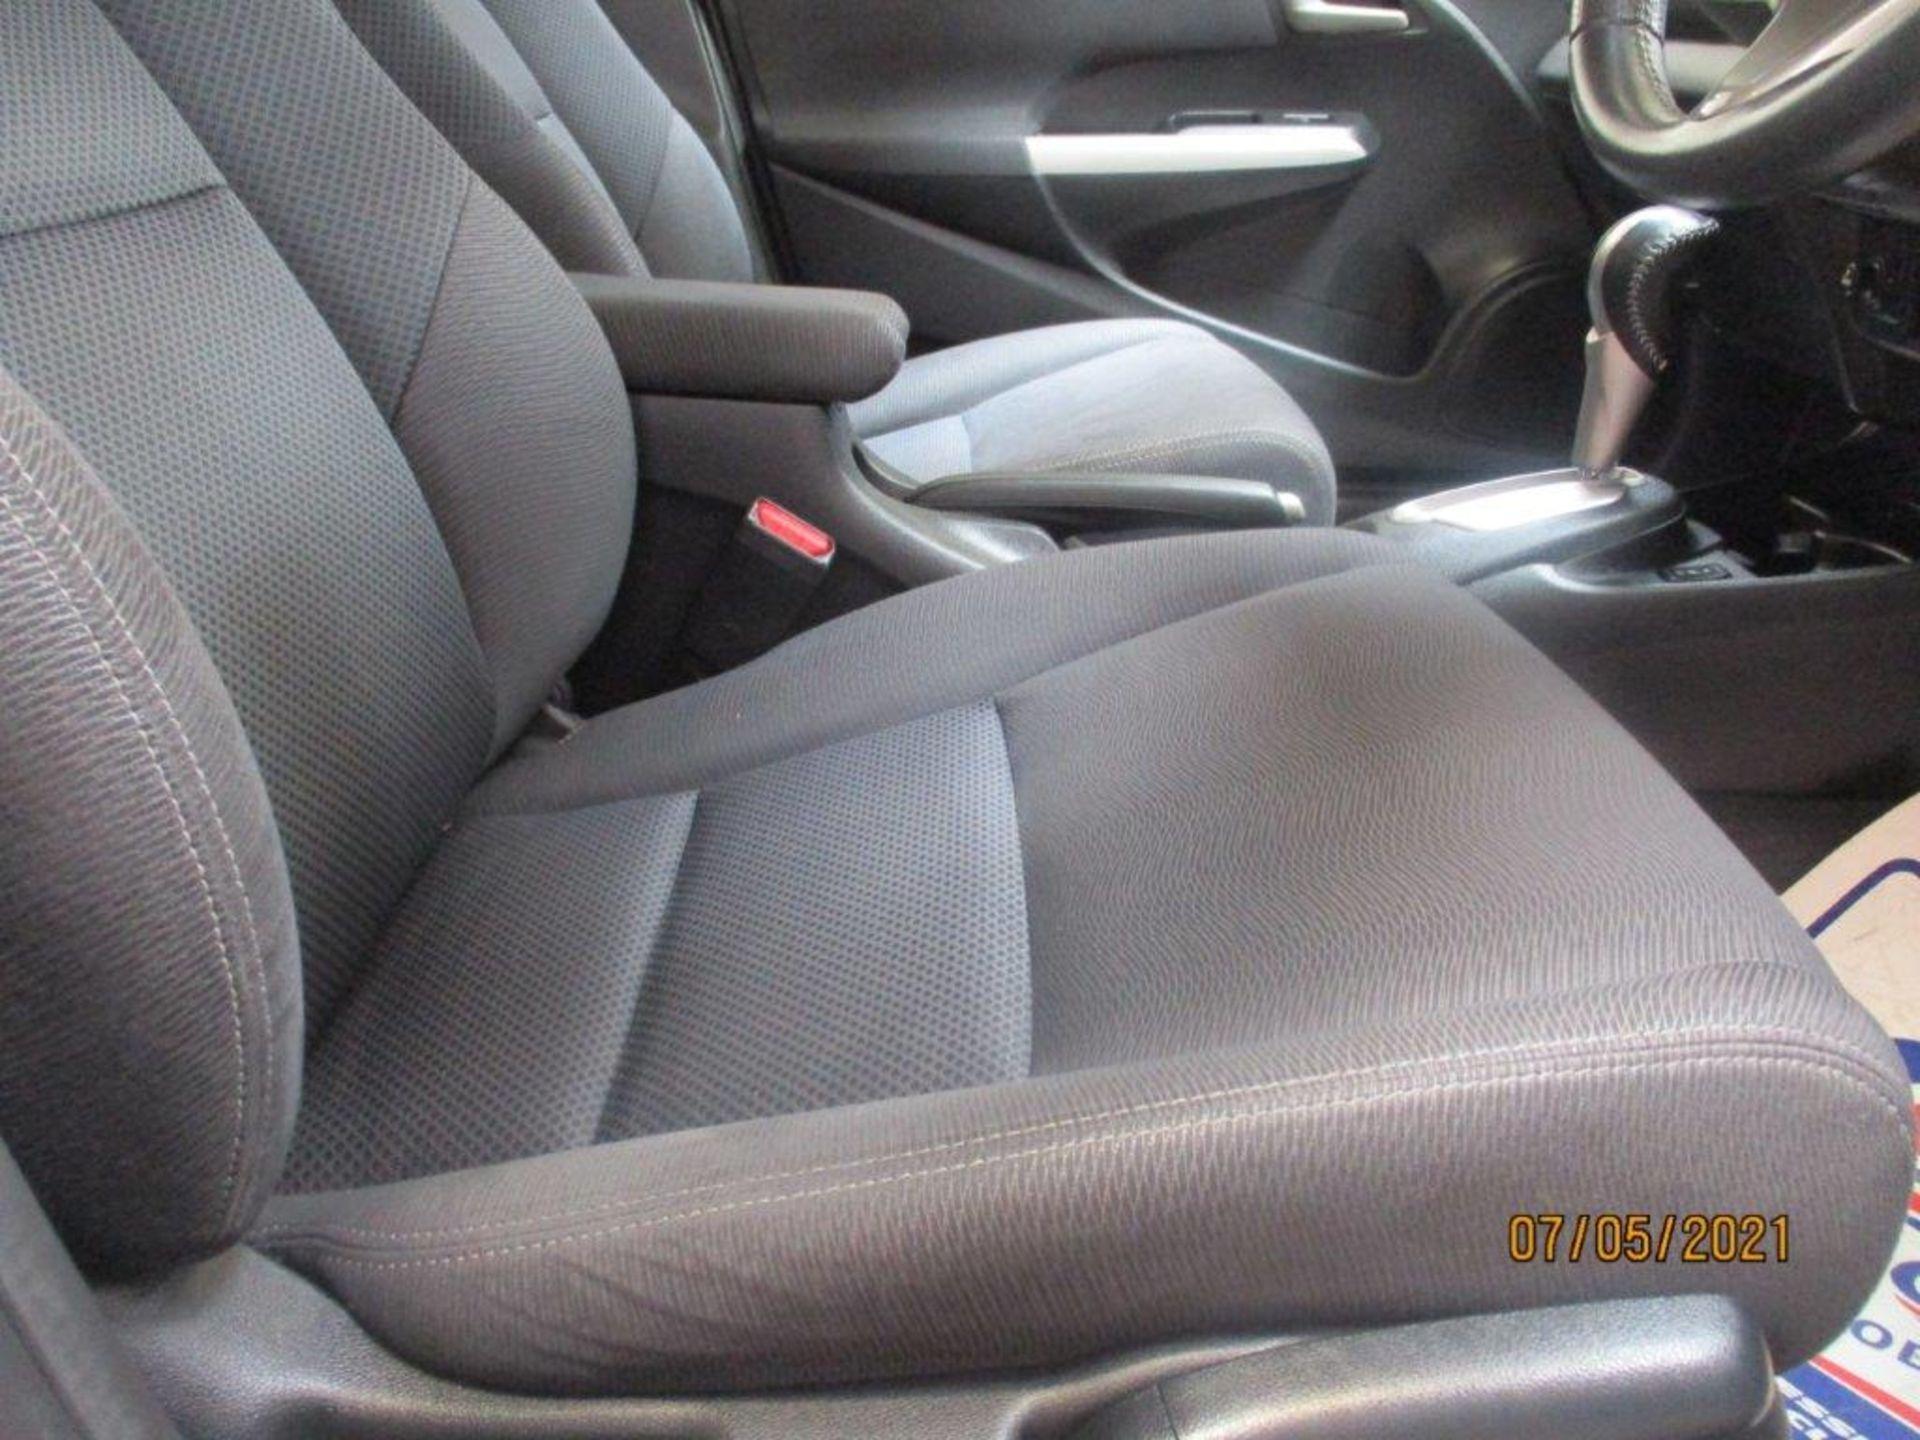 11 11 Honda Insight ES CVT - Image 18 of 21